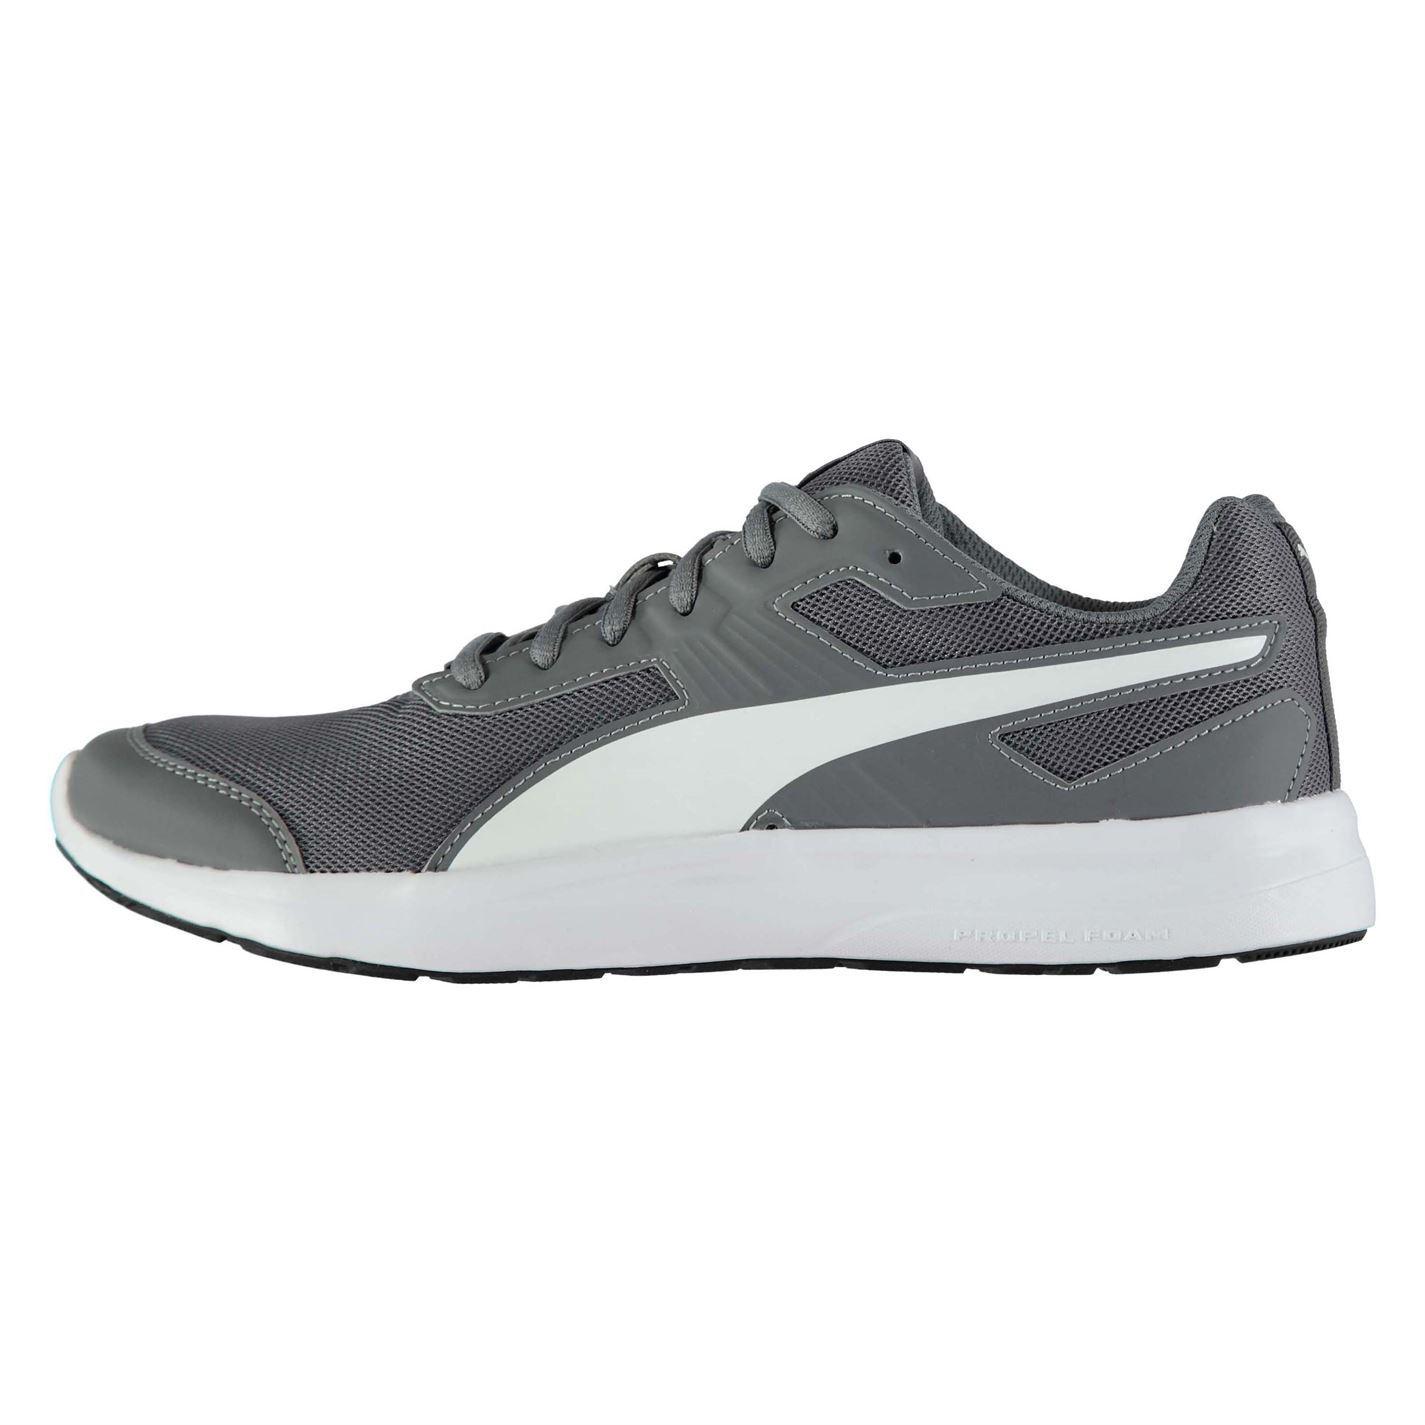 e4747577ef4 ... Puma Escaper Mesh Trainers Mens Grey Athletic Sneakers Shoes ...